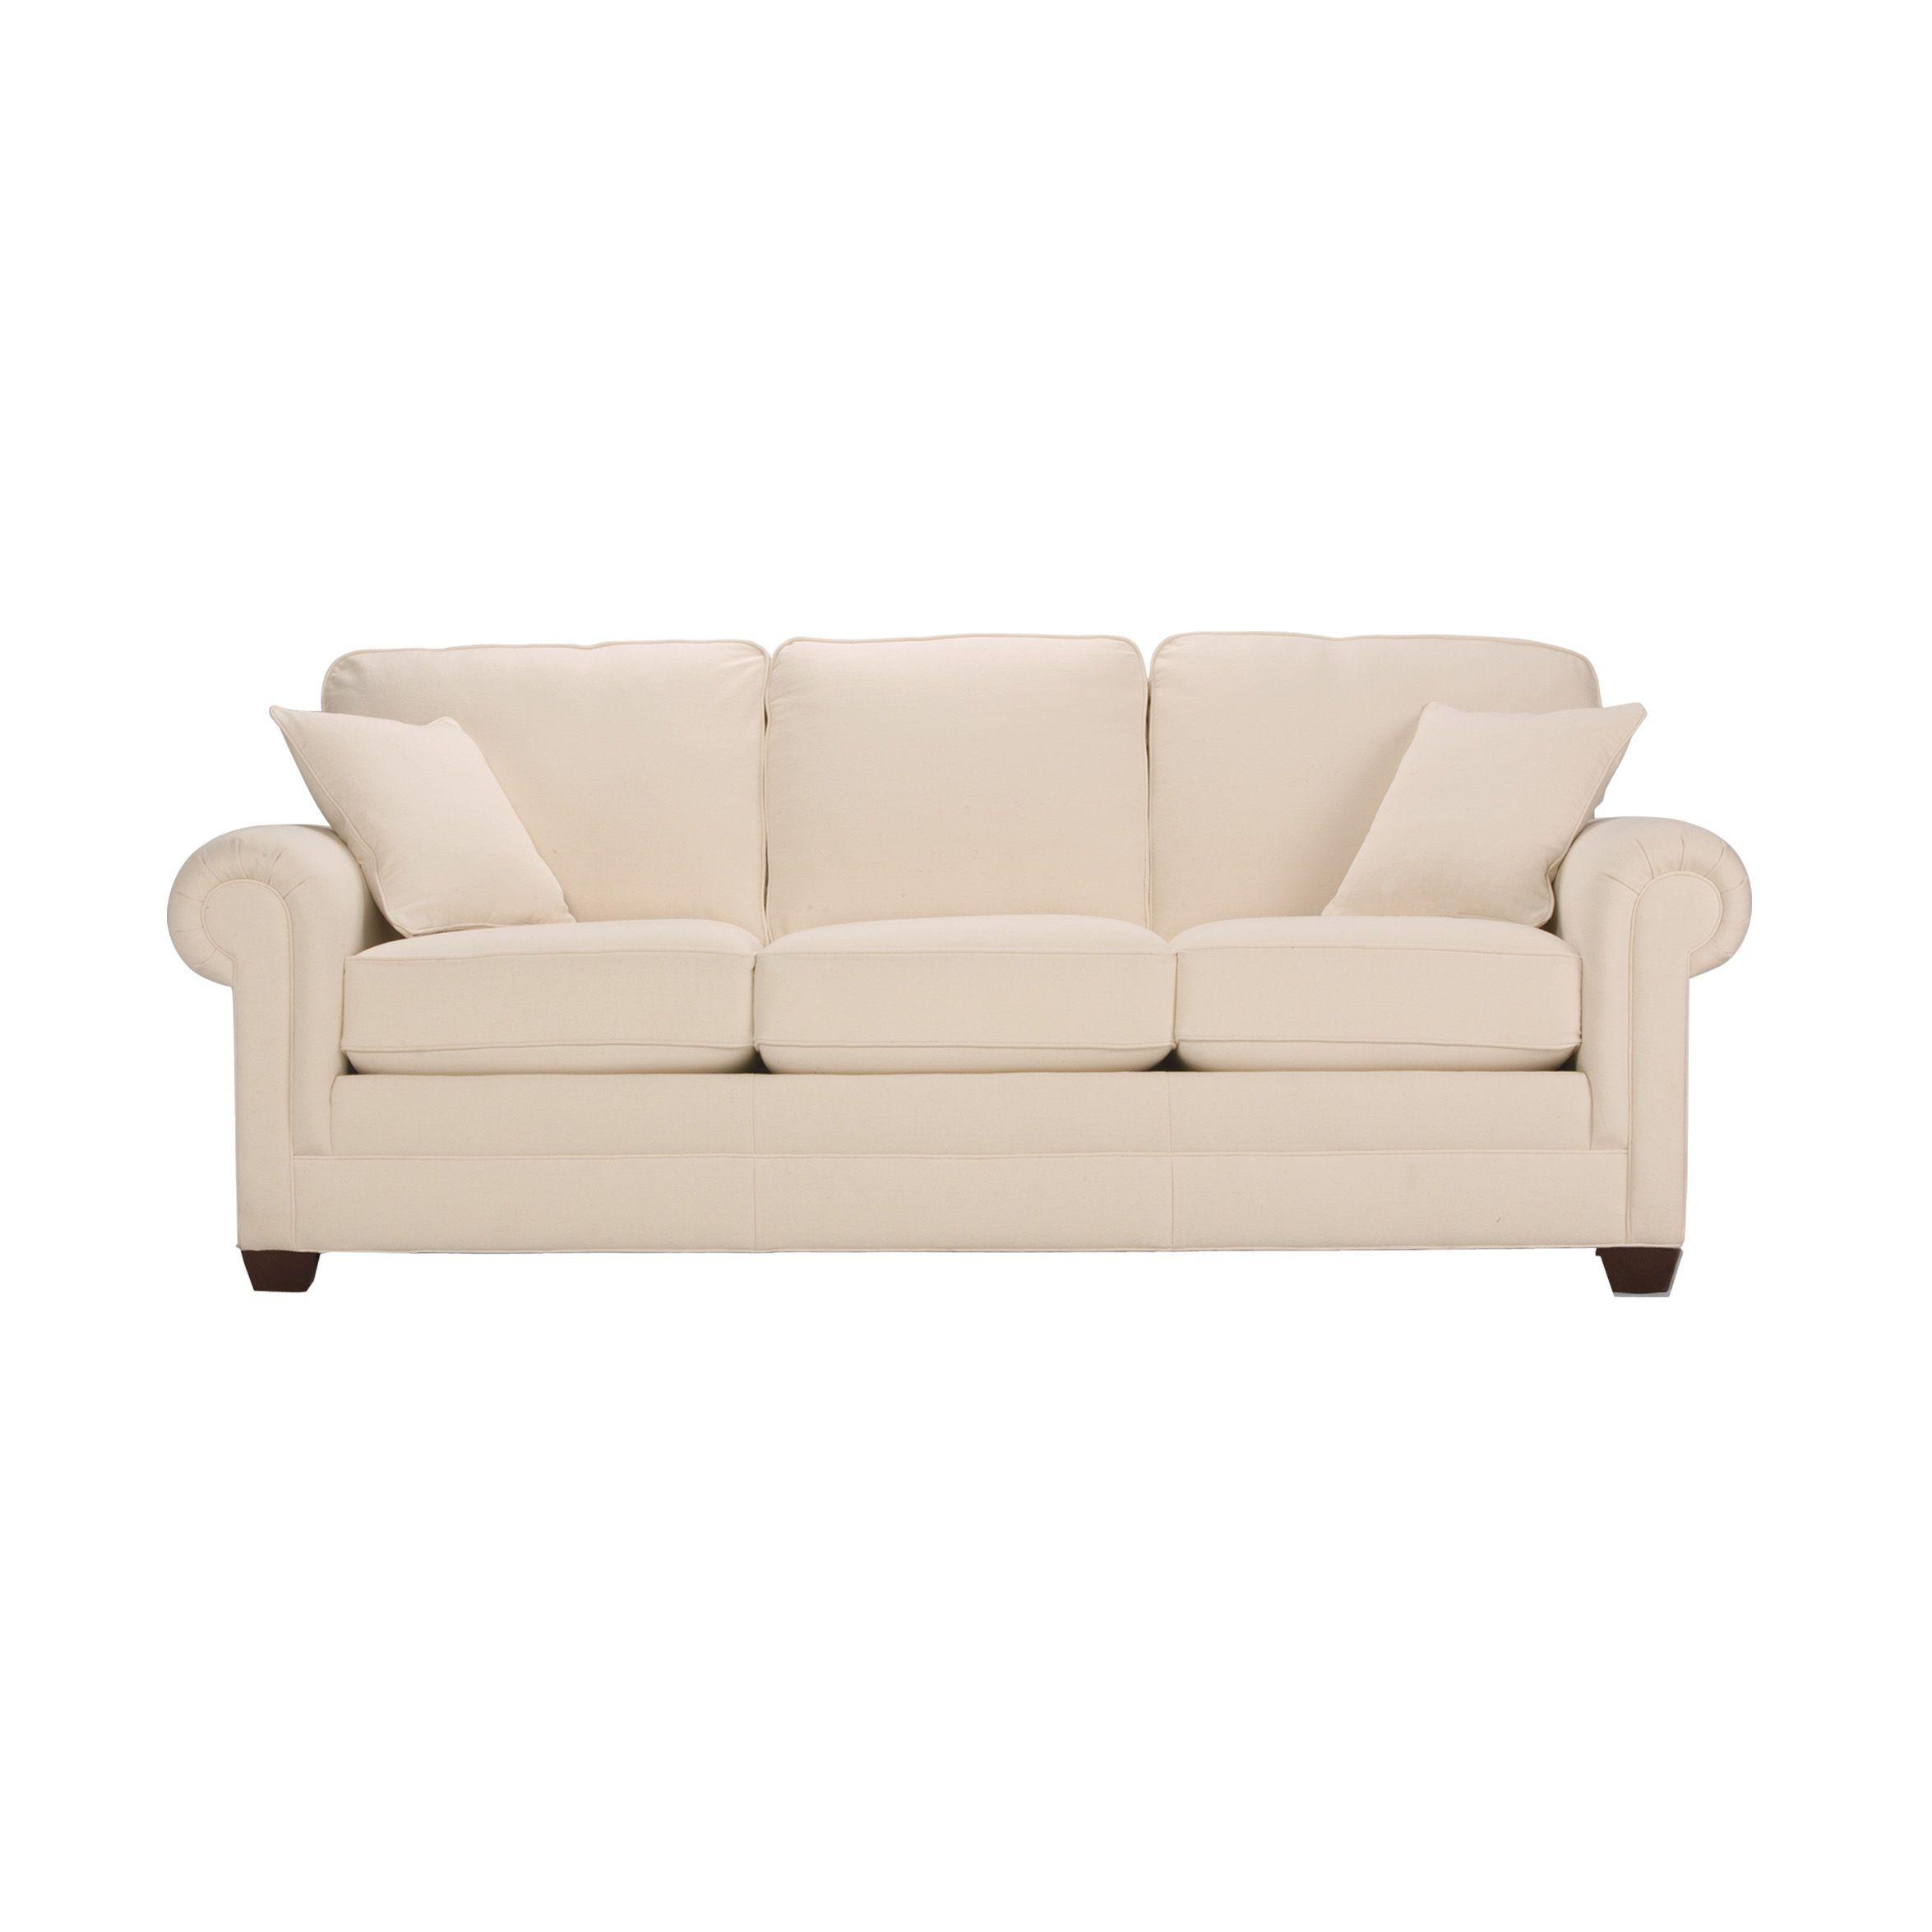 Conor Sofa Ethan Allen Us Furniture Sofa Three